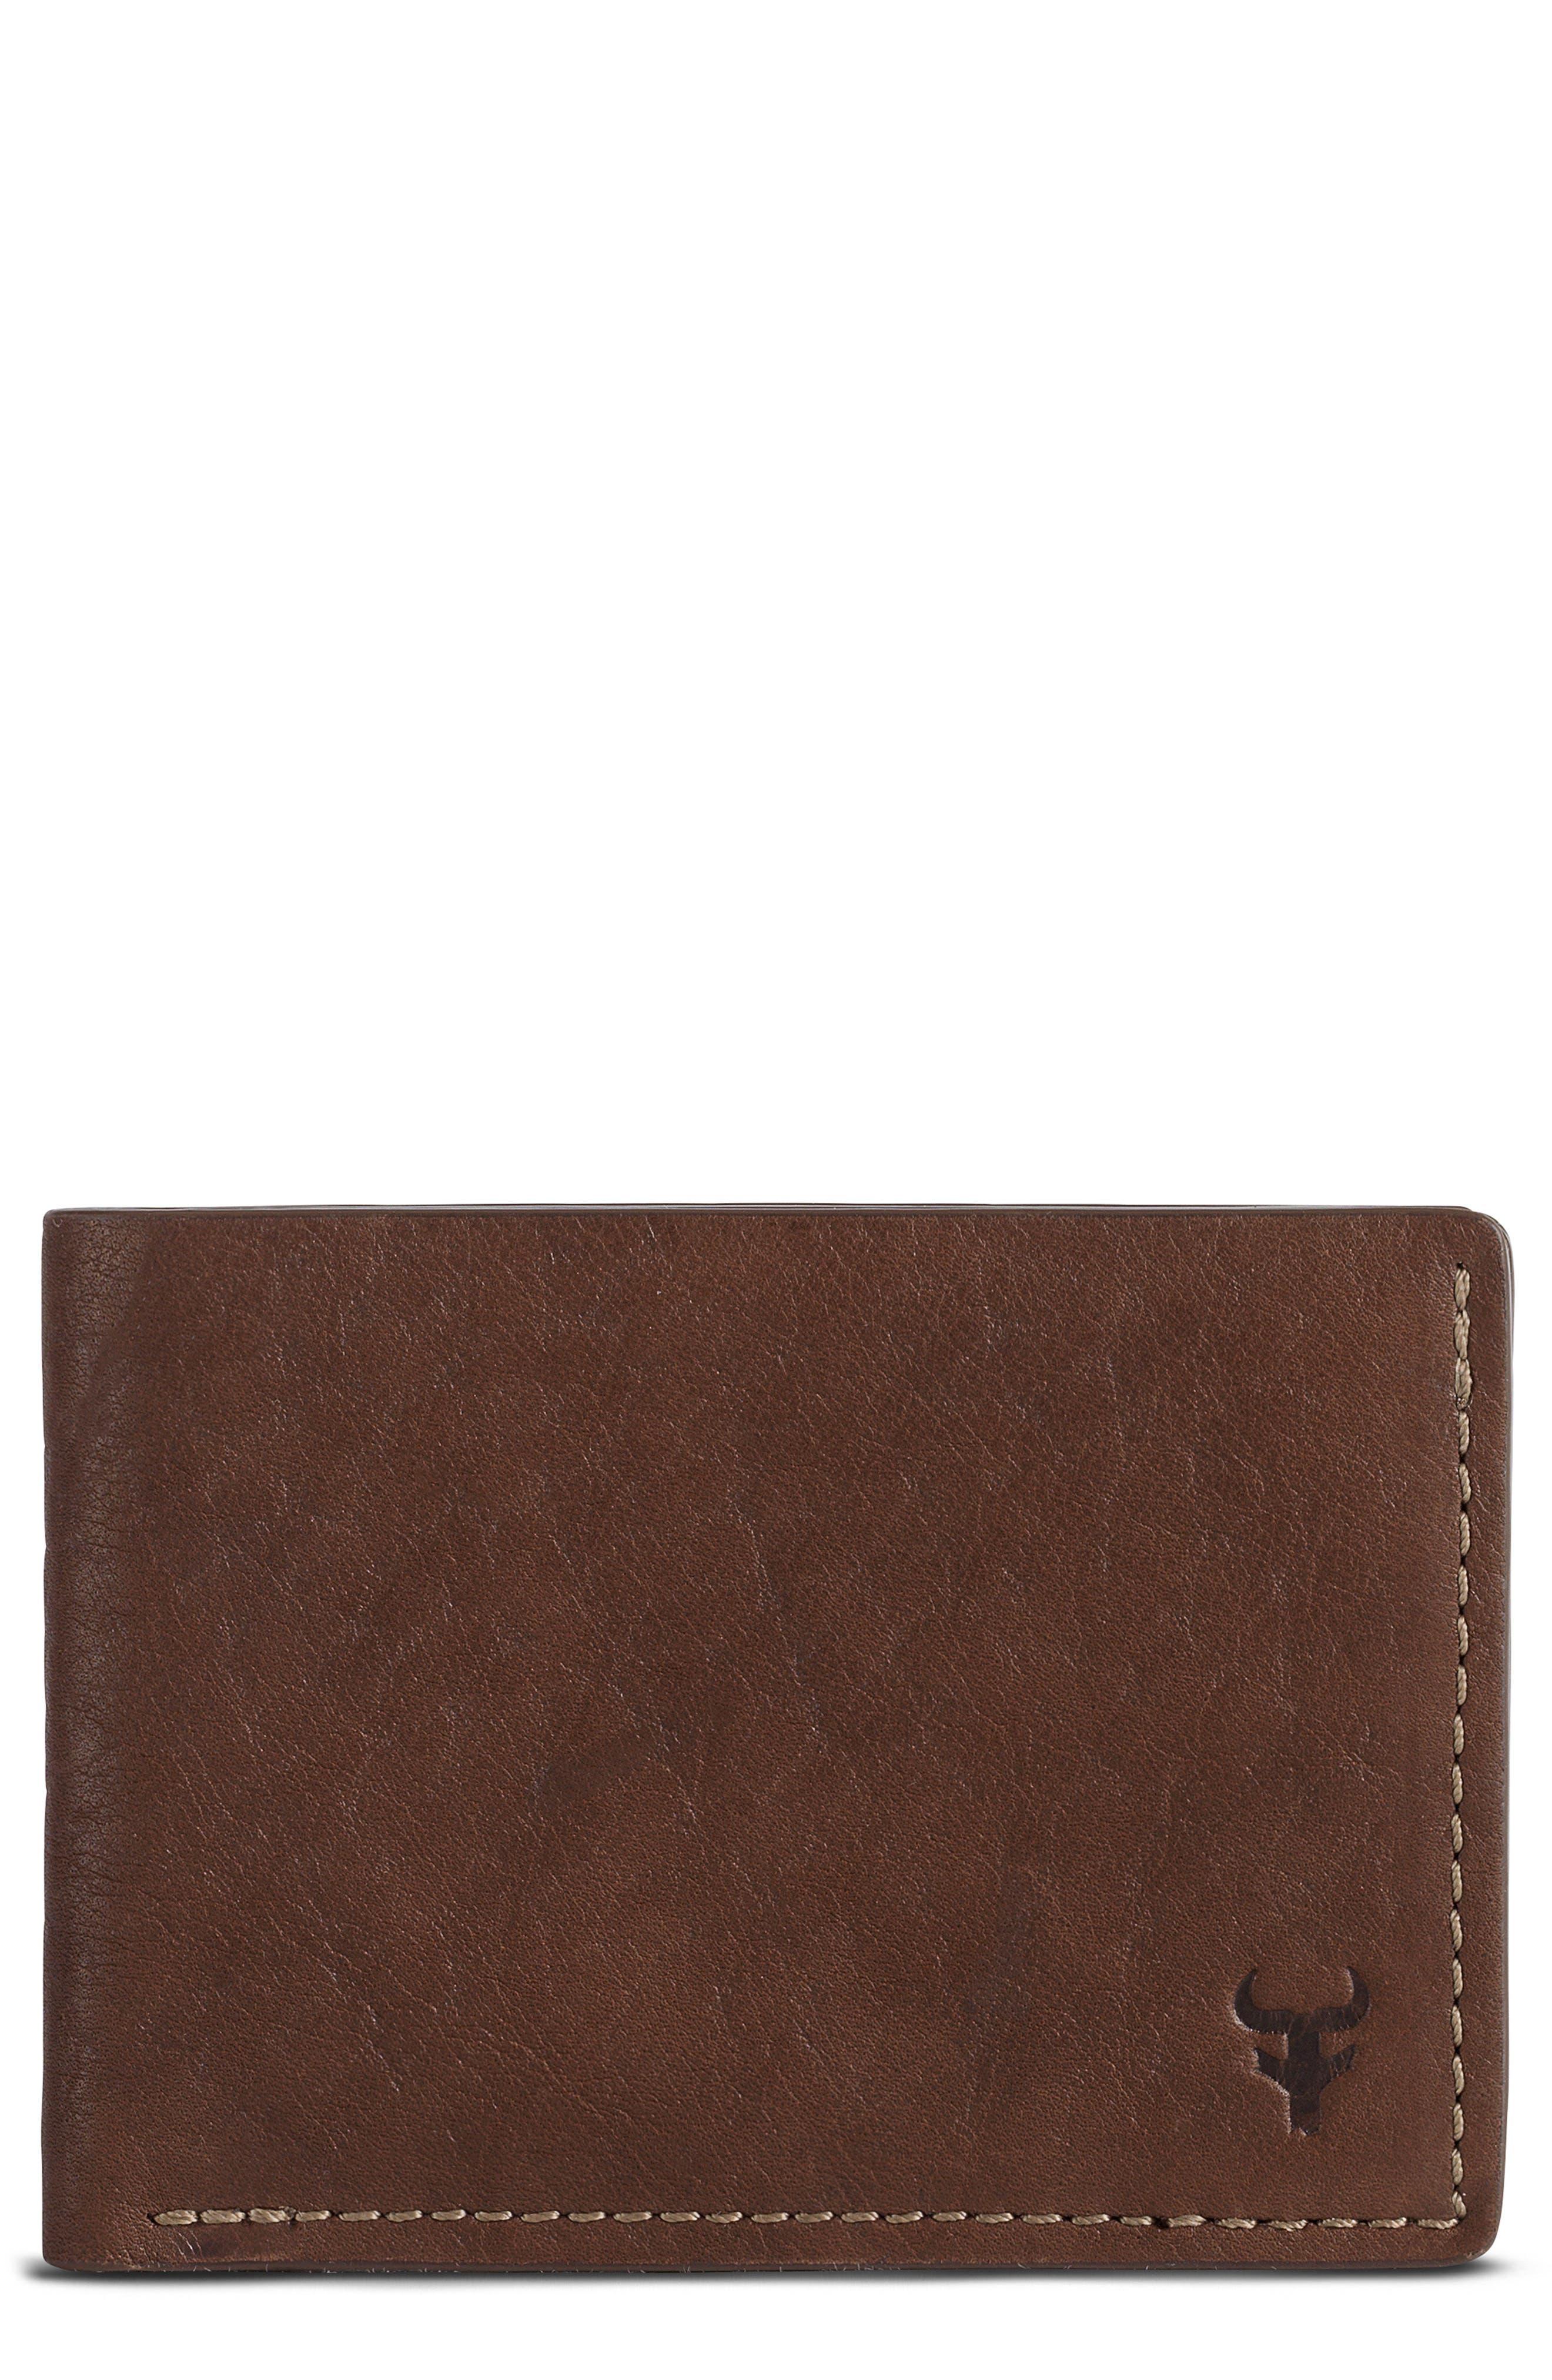 Jackson Super Slim Wallet,                             Main thumbnail 1, color,                             200